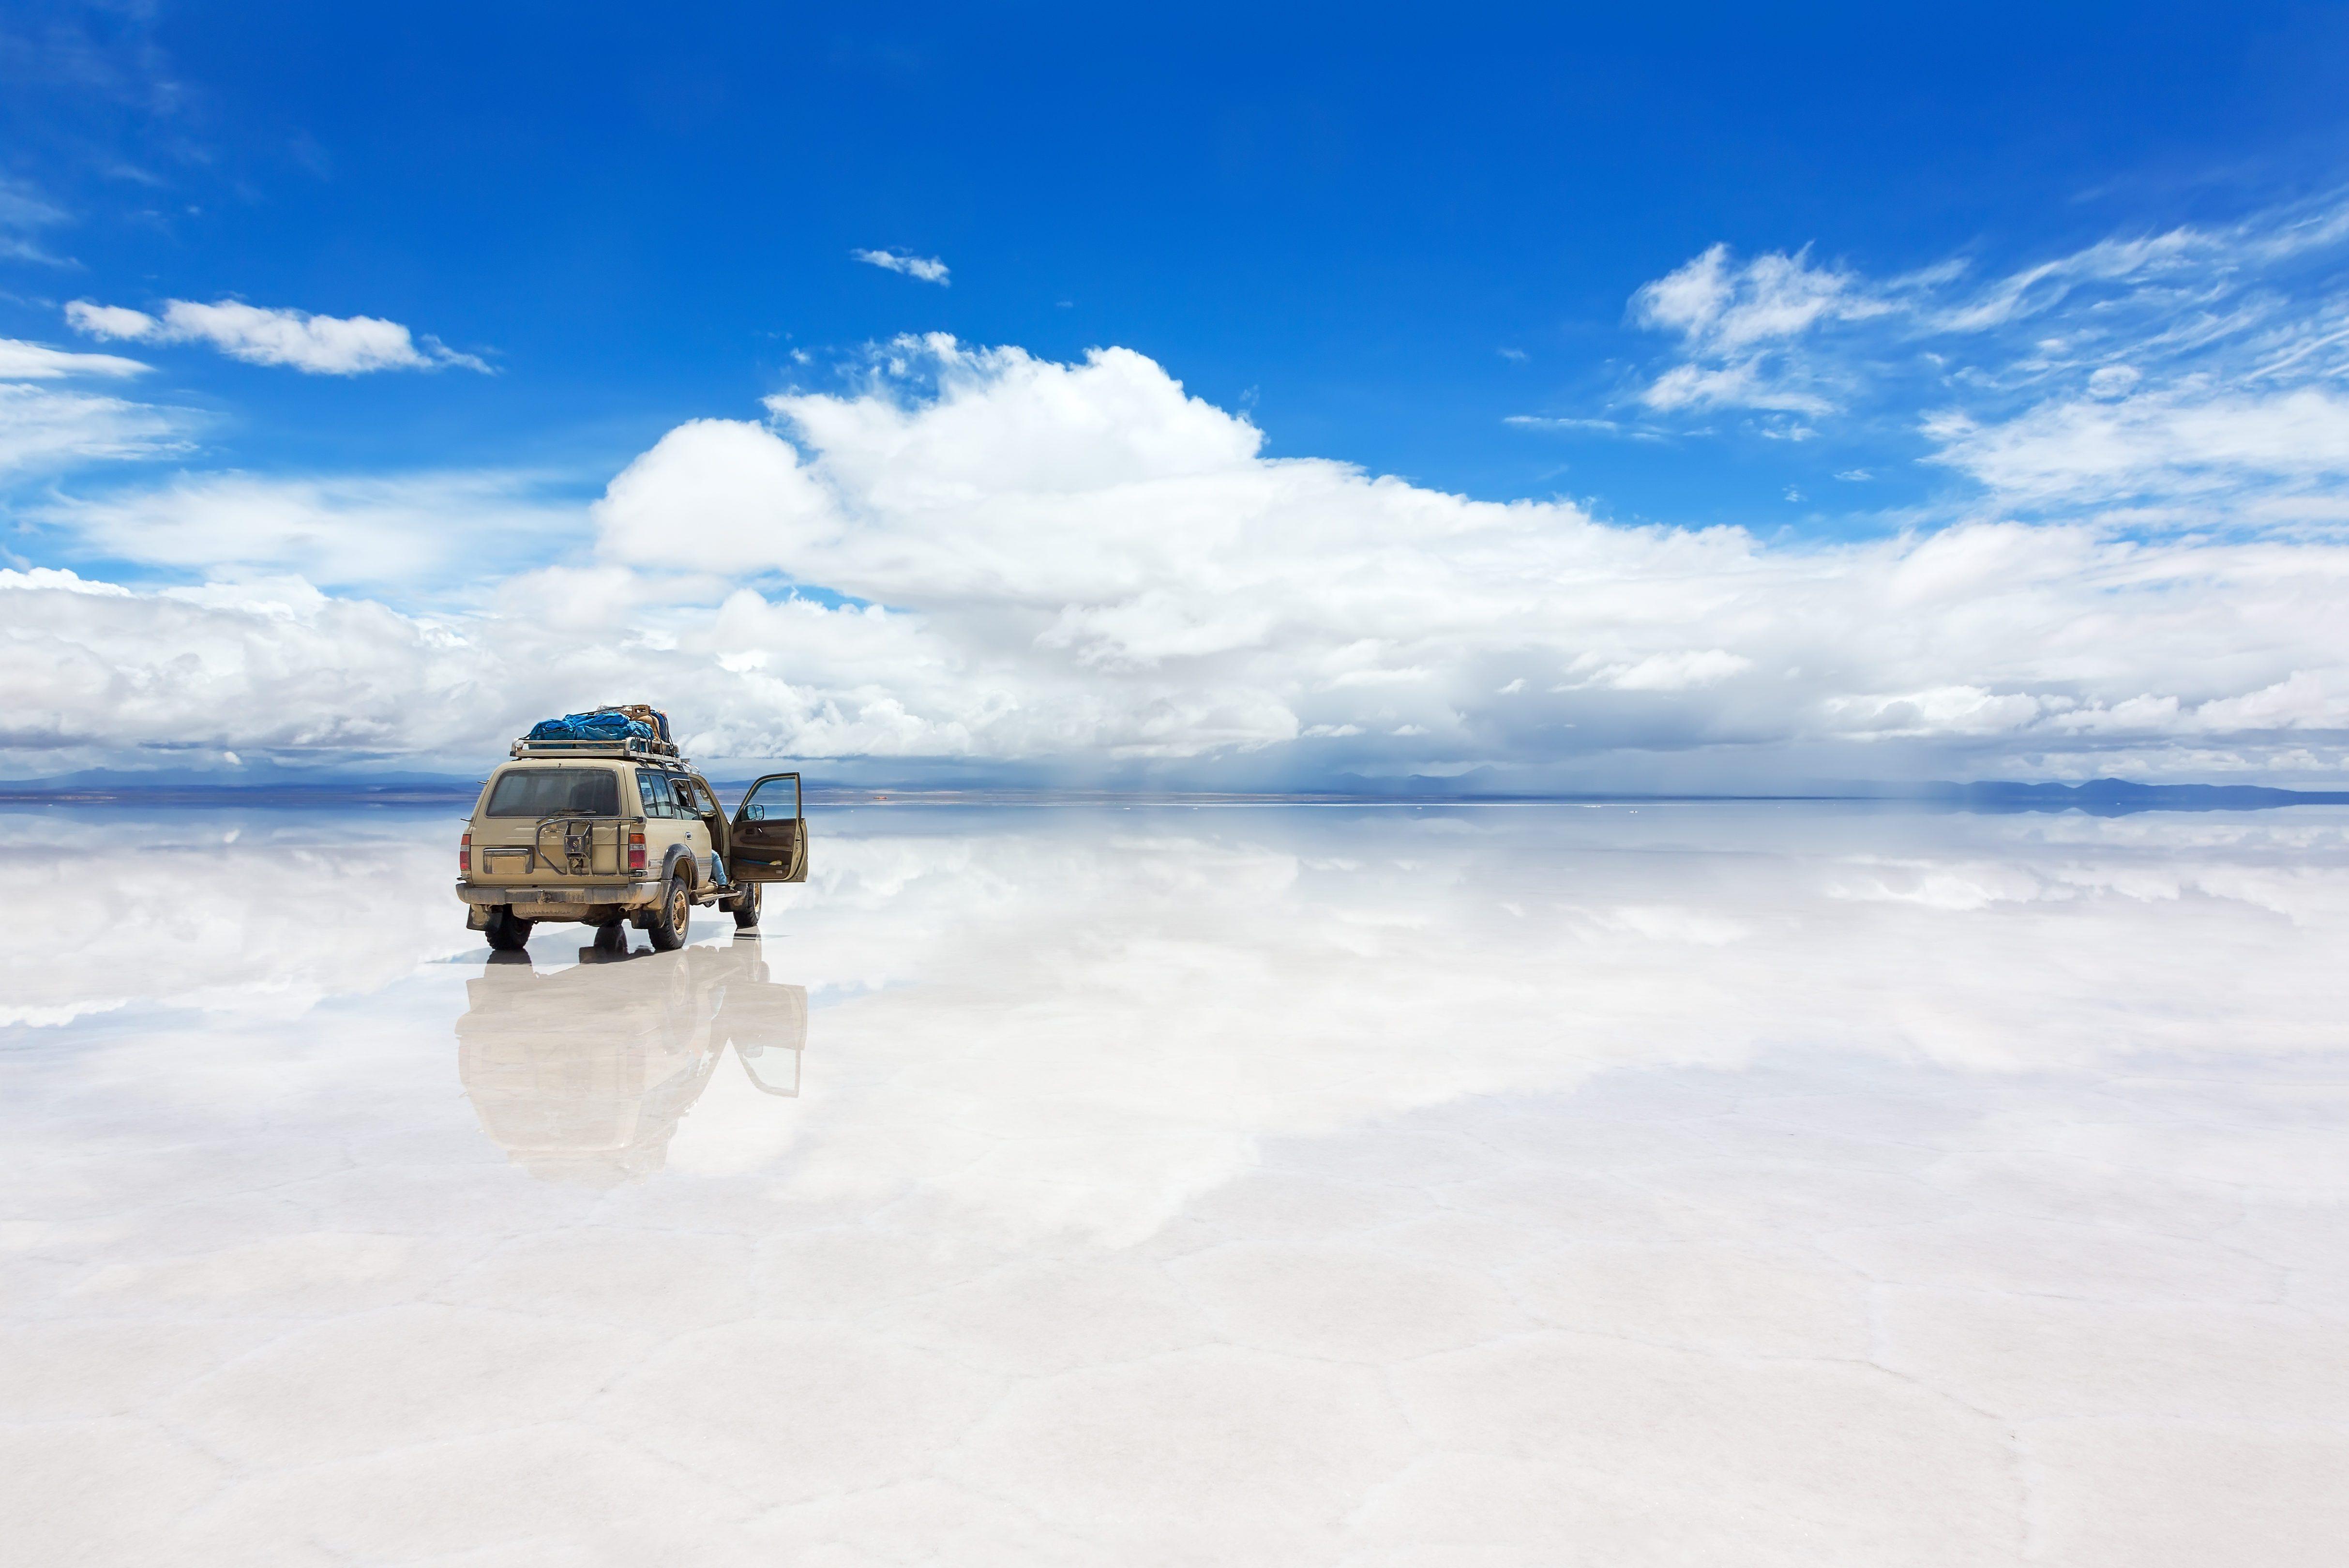 Jeep on the Uyuni Salar in Bolivia